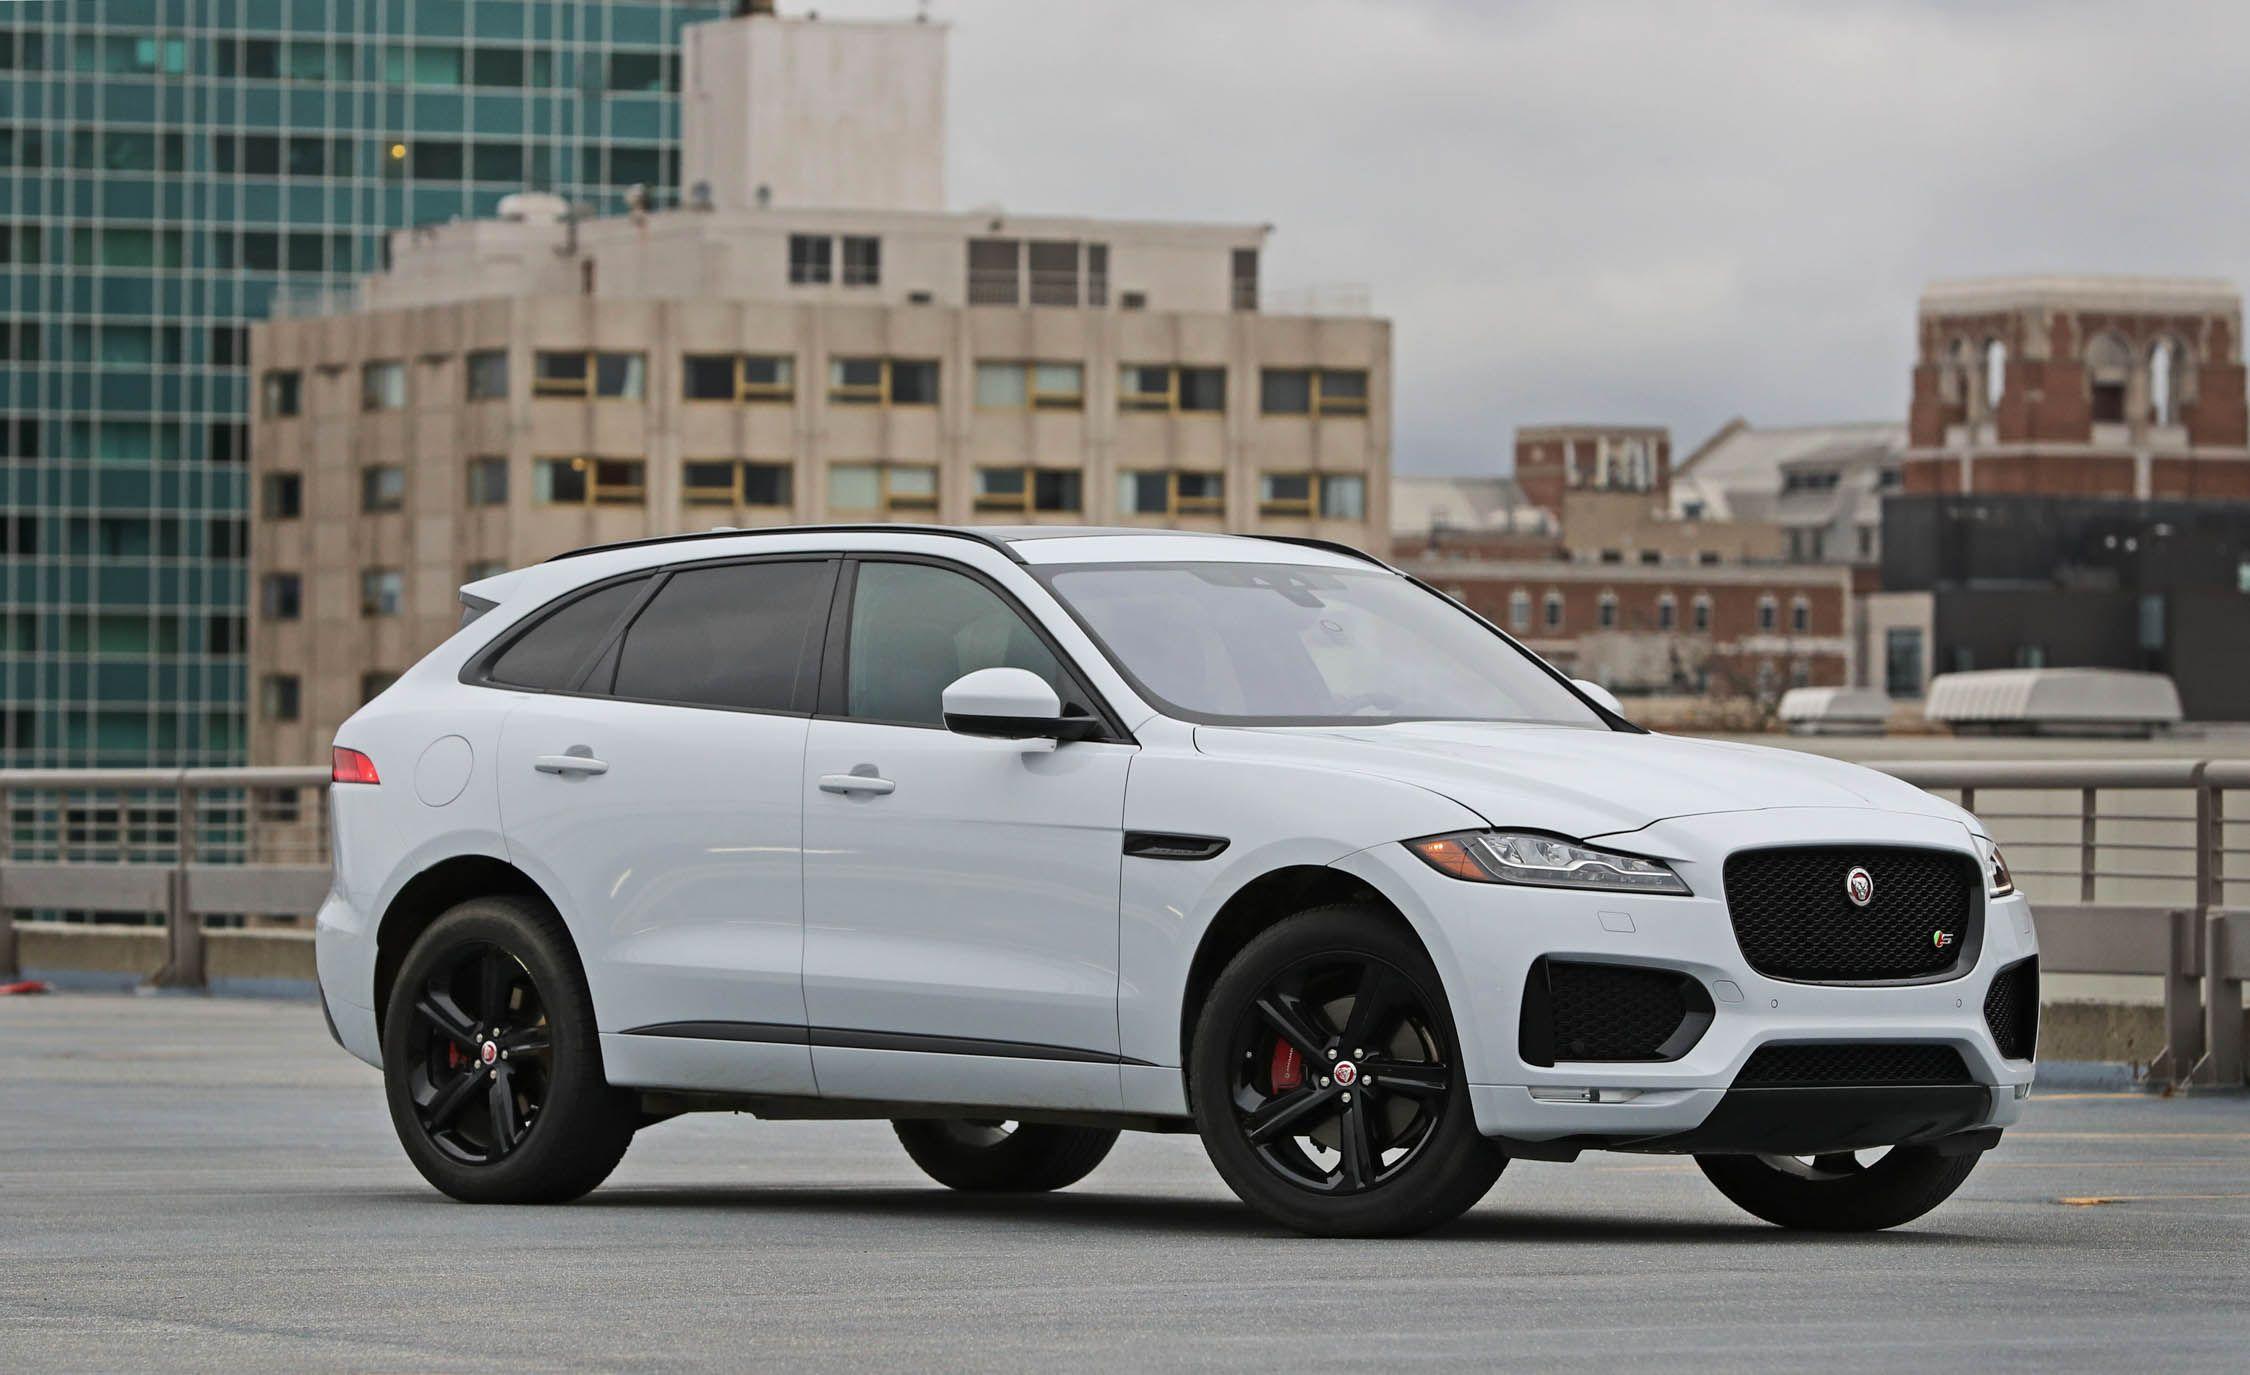 2018 Jaguar F-Pace | Exterior Design and Dimensions Review ...